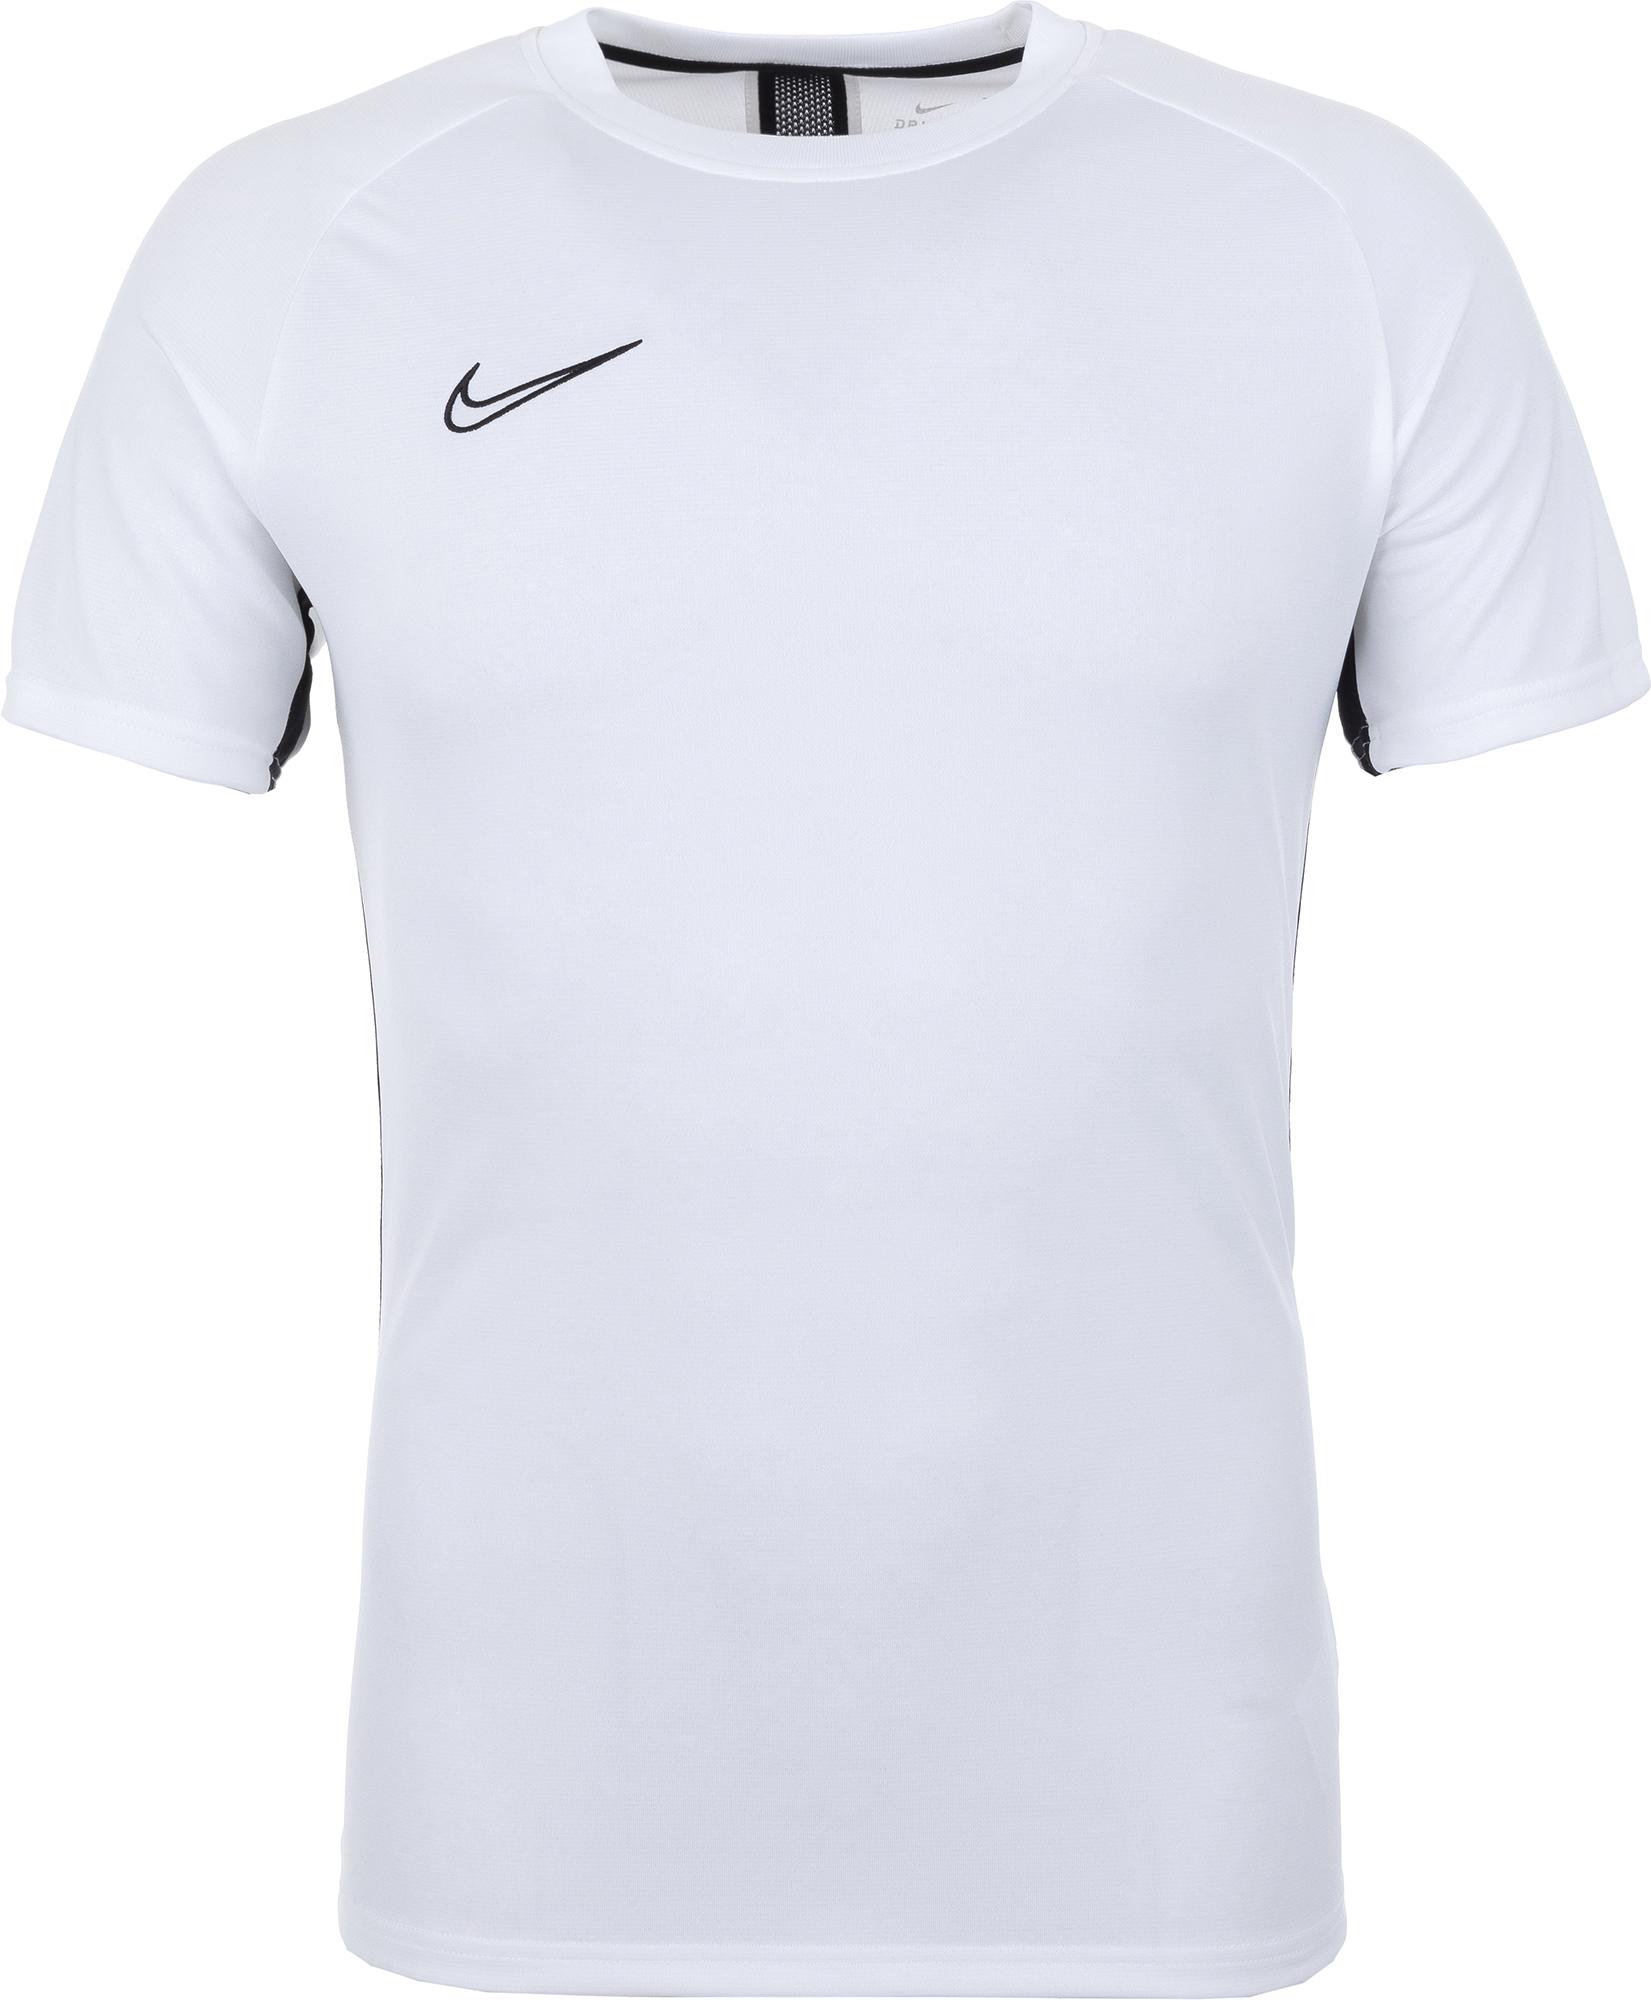 Фото Nike Футболка мужская Nike Academy, размер 52-54